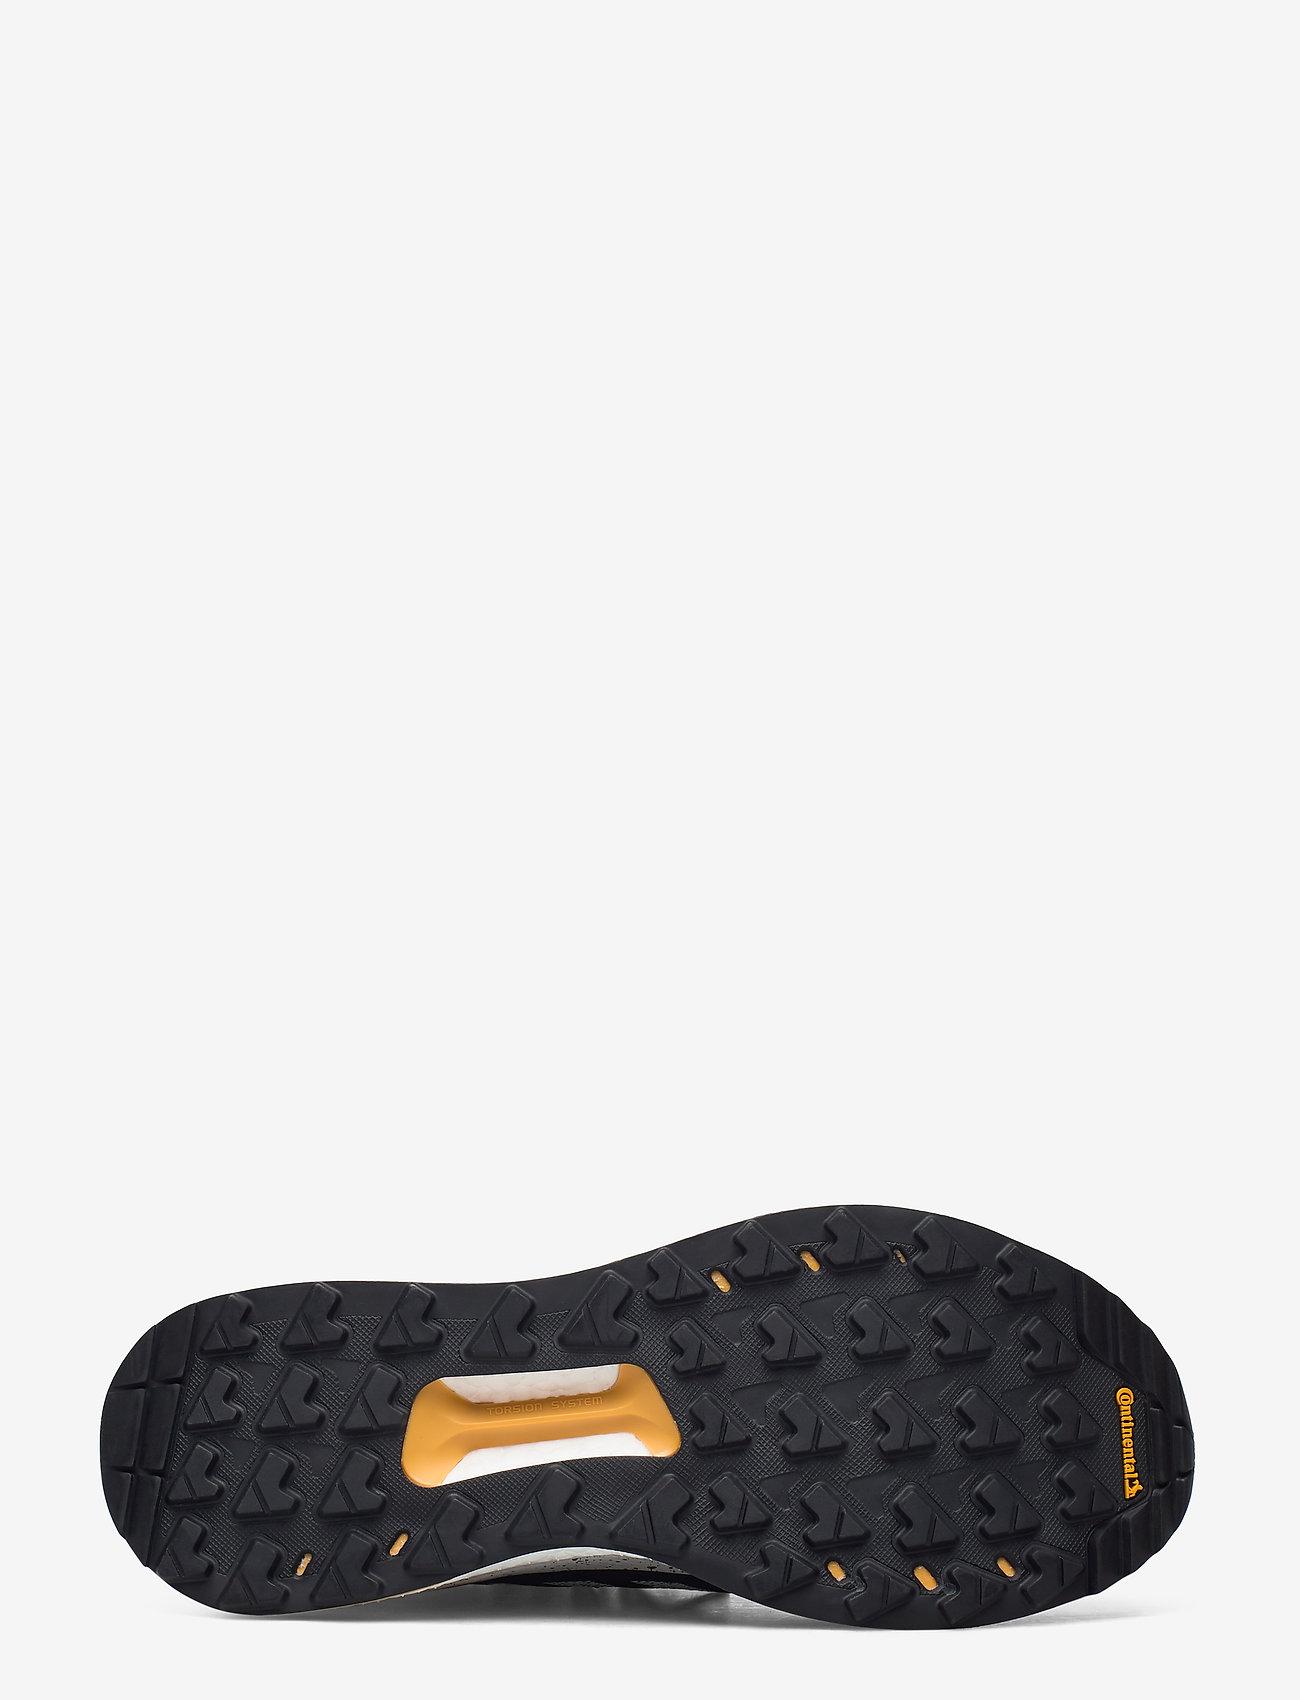 adidas Performance - Terrex Free Hiker Blue Hiking - chaussures de randonnée - legear/gretwo/sigcya - 4